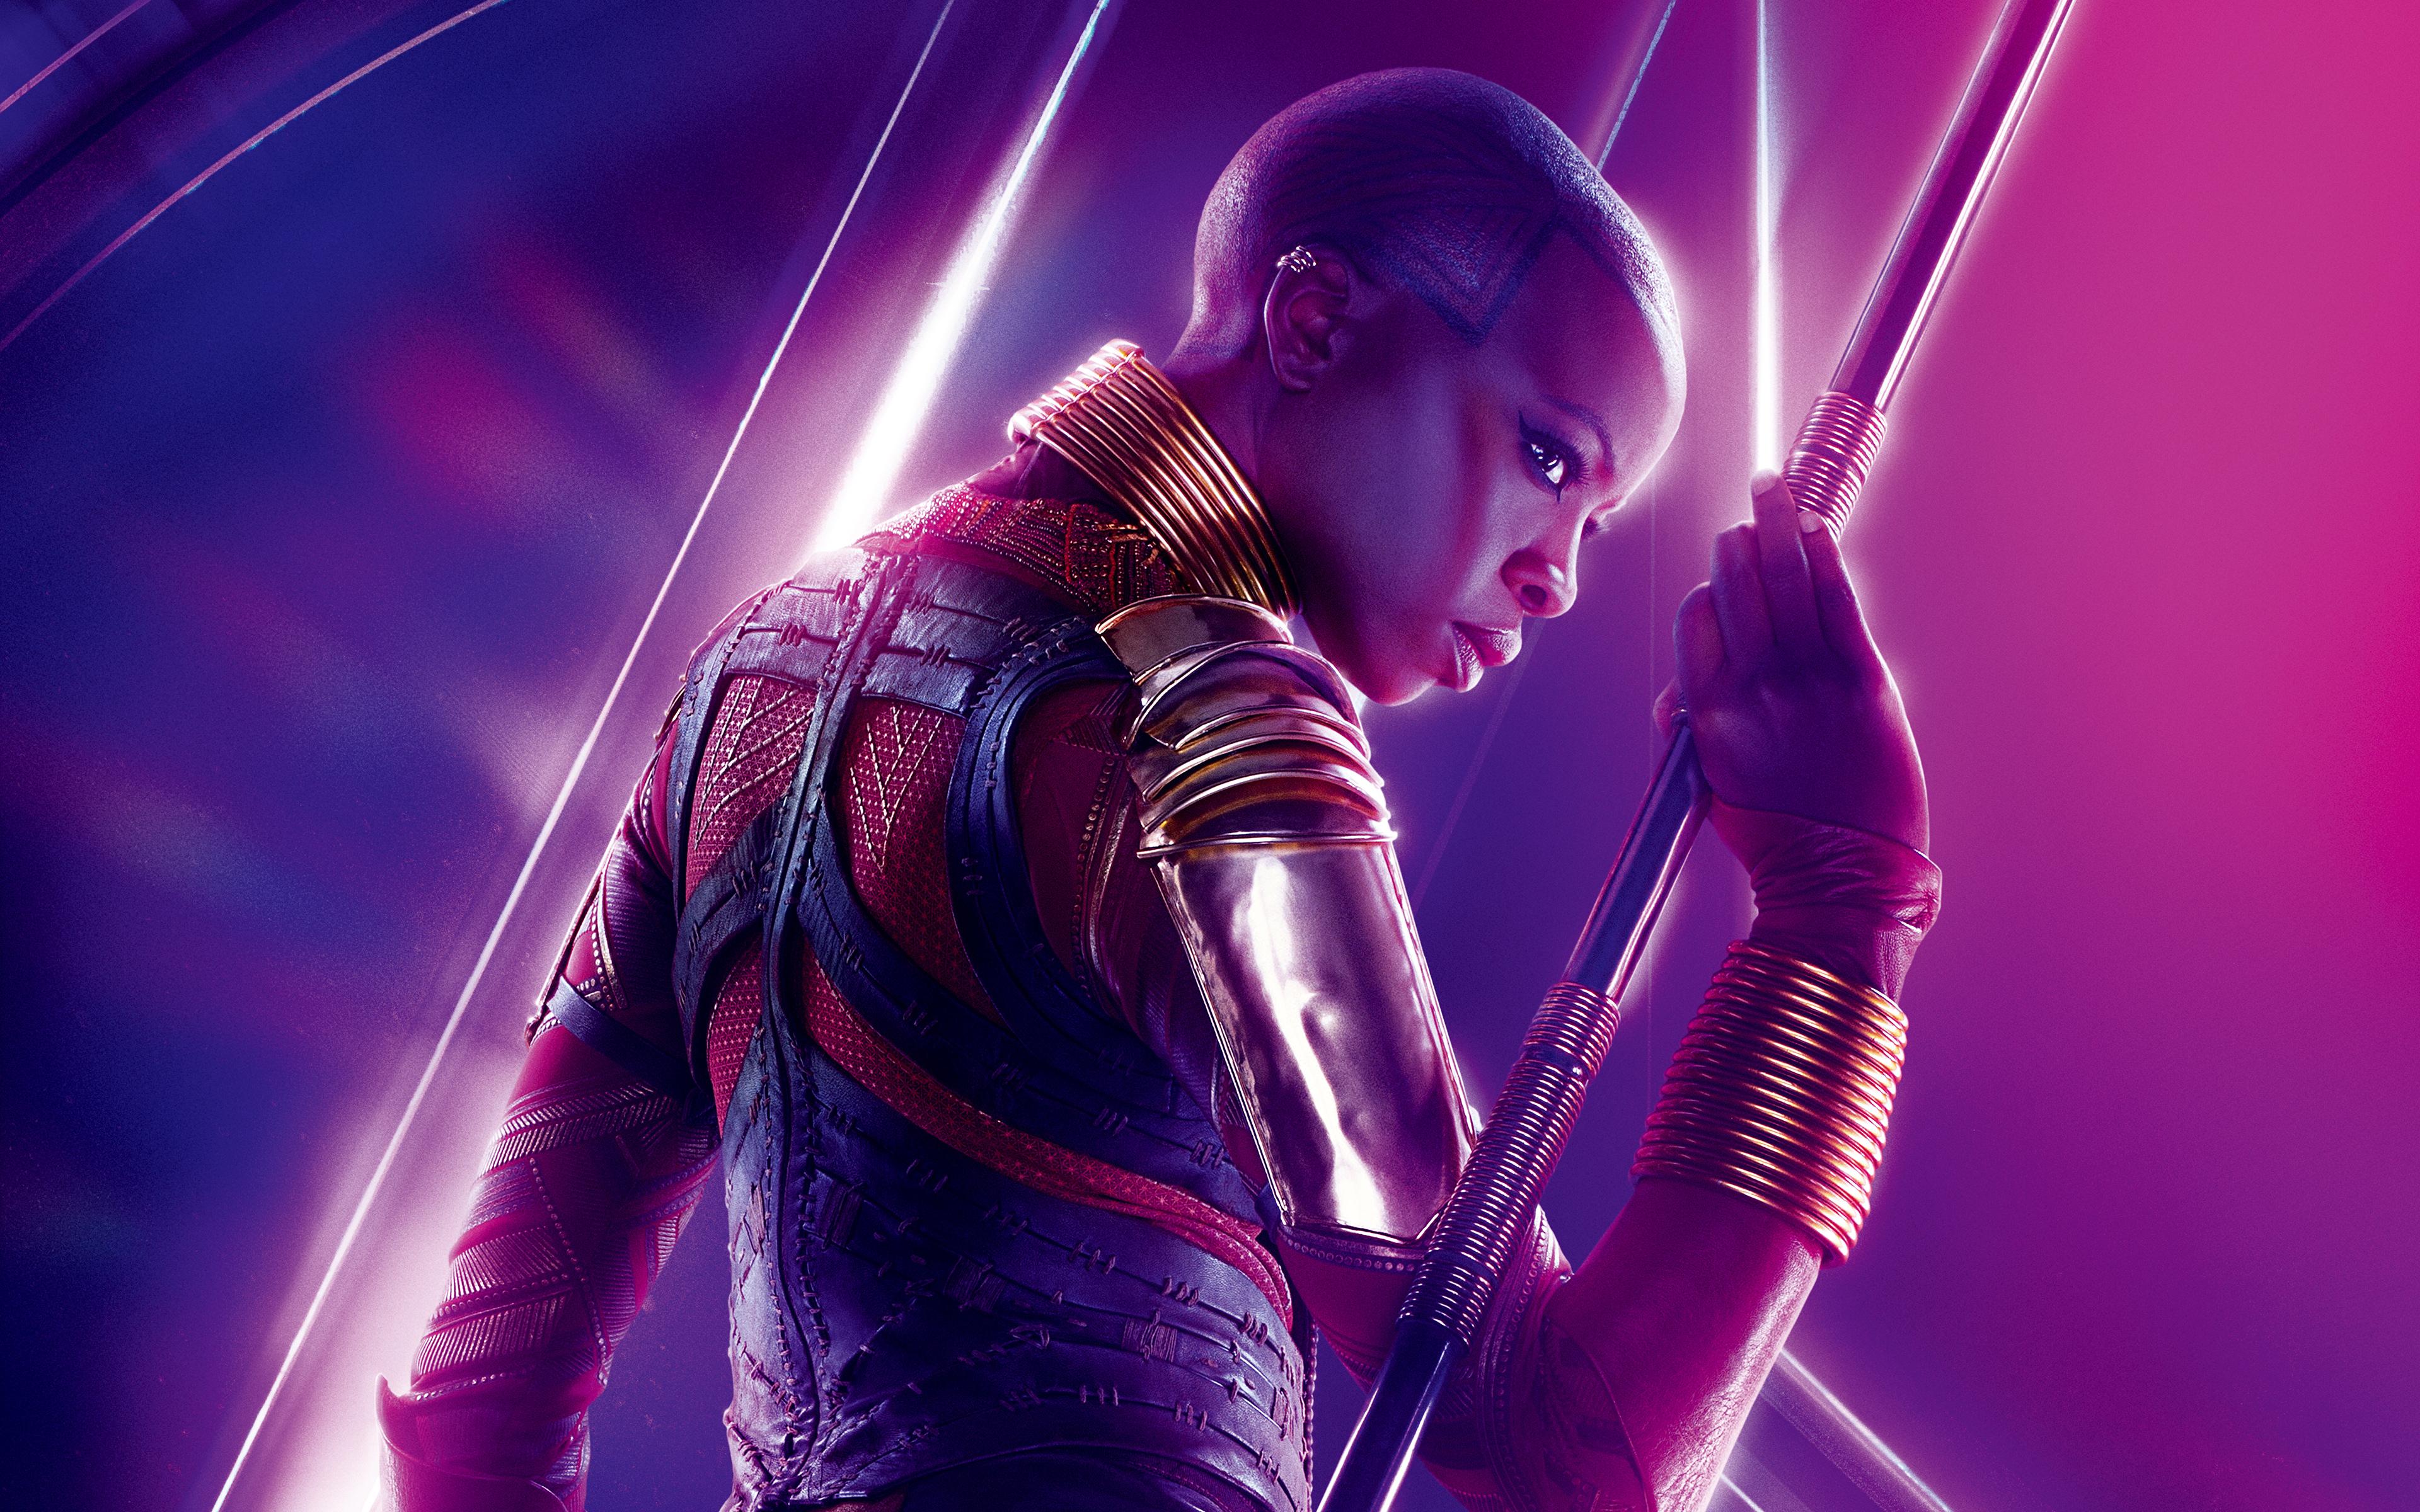 2048x2048 The Incredibles 2 Movie 2018 Ipad Air Hd 4k: Wallpaper Danai Gurira As Okoye Avengers Infinity War 5K